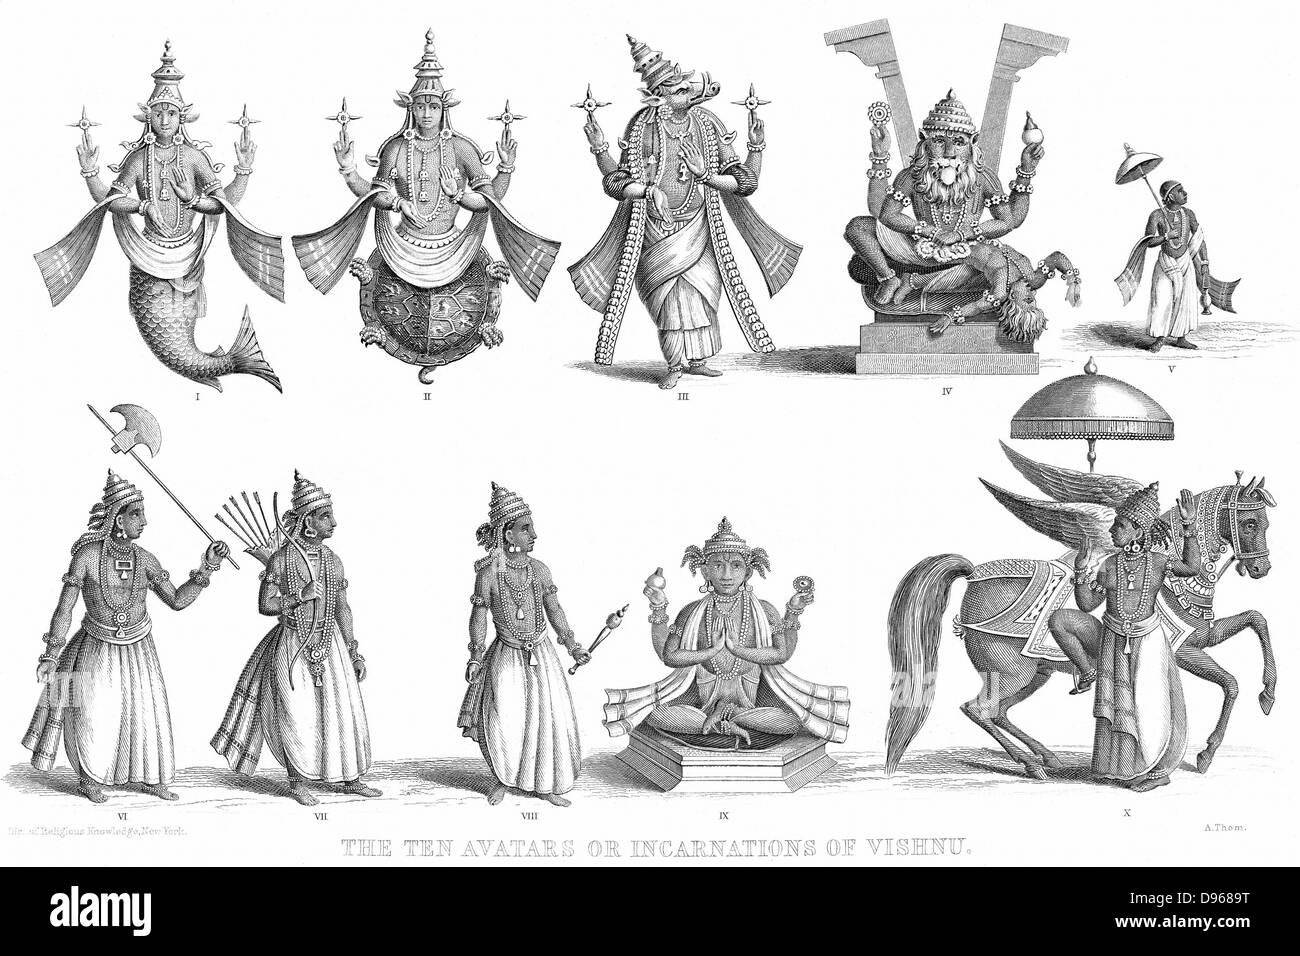 Vishnu, one of gods of the Hindu Trinity (Trimurti) in his ten incarnations or avatars. Engraving c1880 - Stock Image